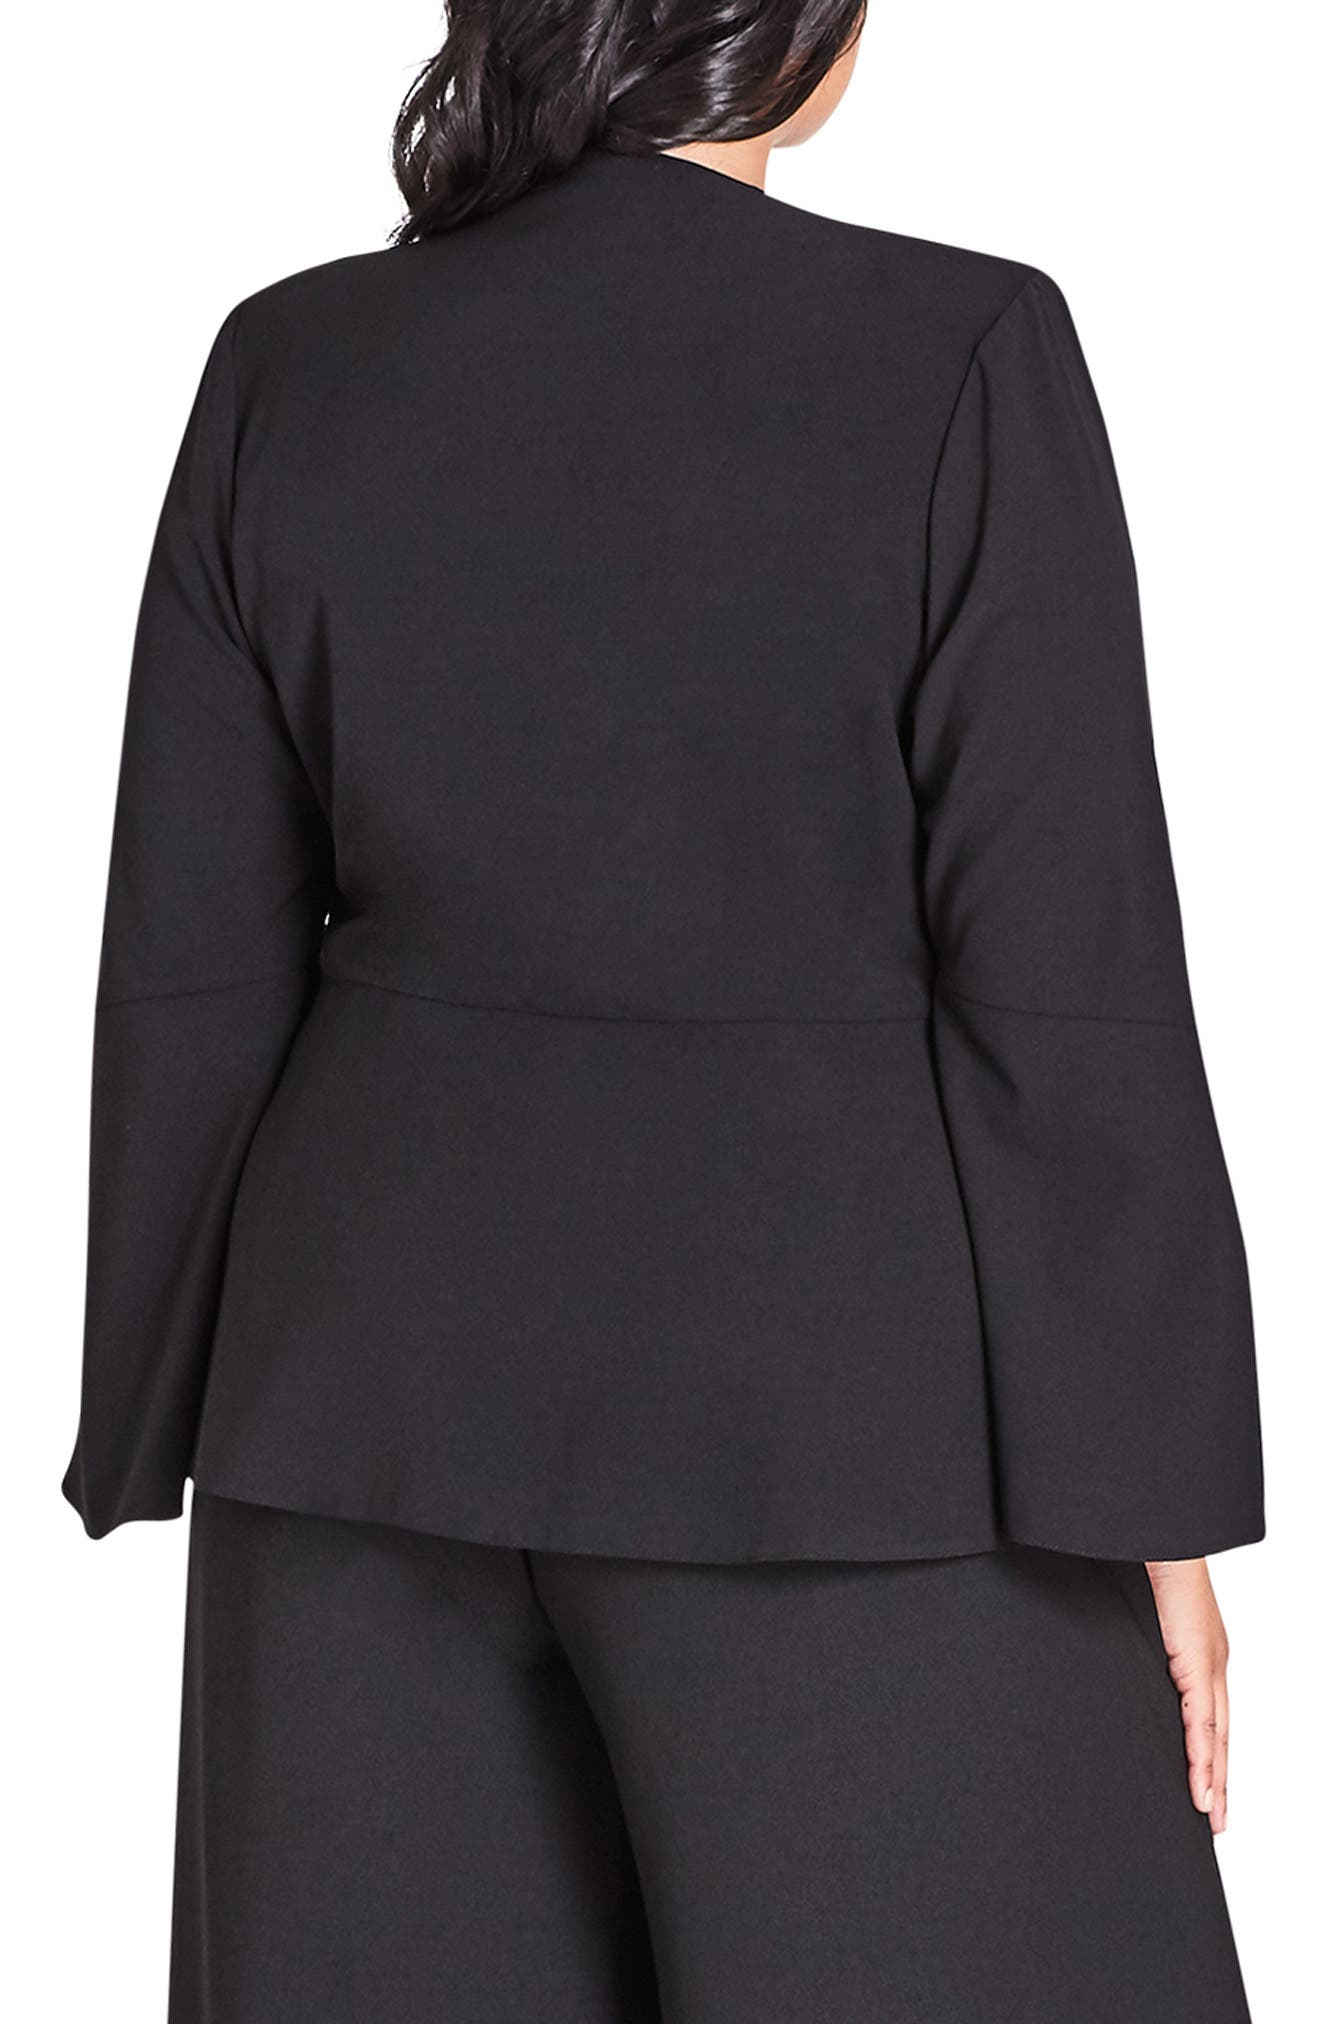 Noveau Fancy Split Sleeve Jacket,                             Alternate thumbnail 2, color,                             BLACK